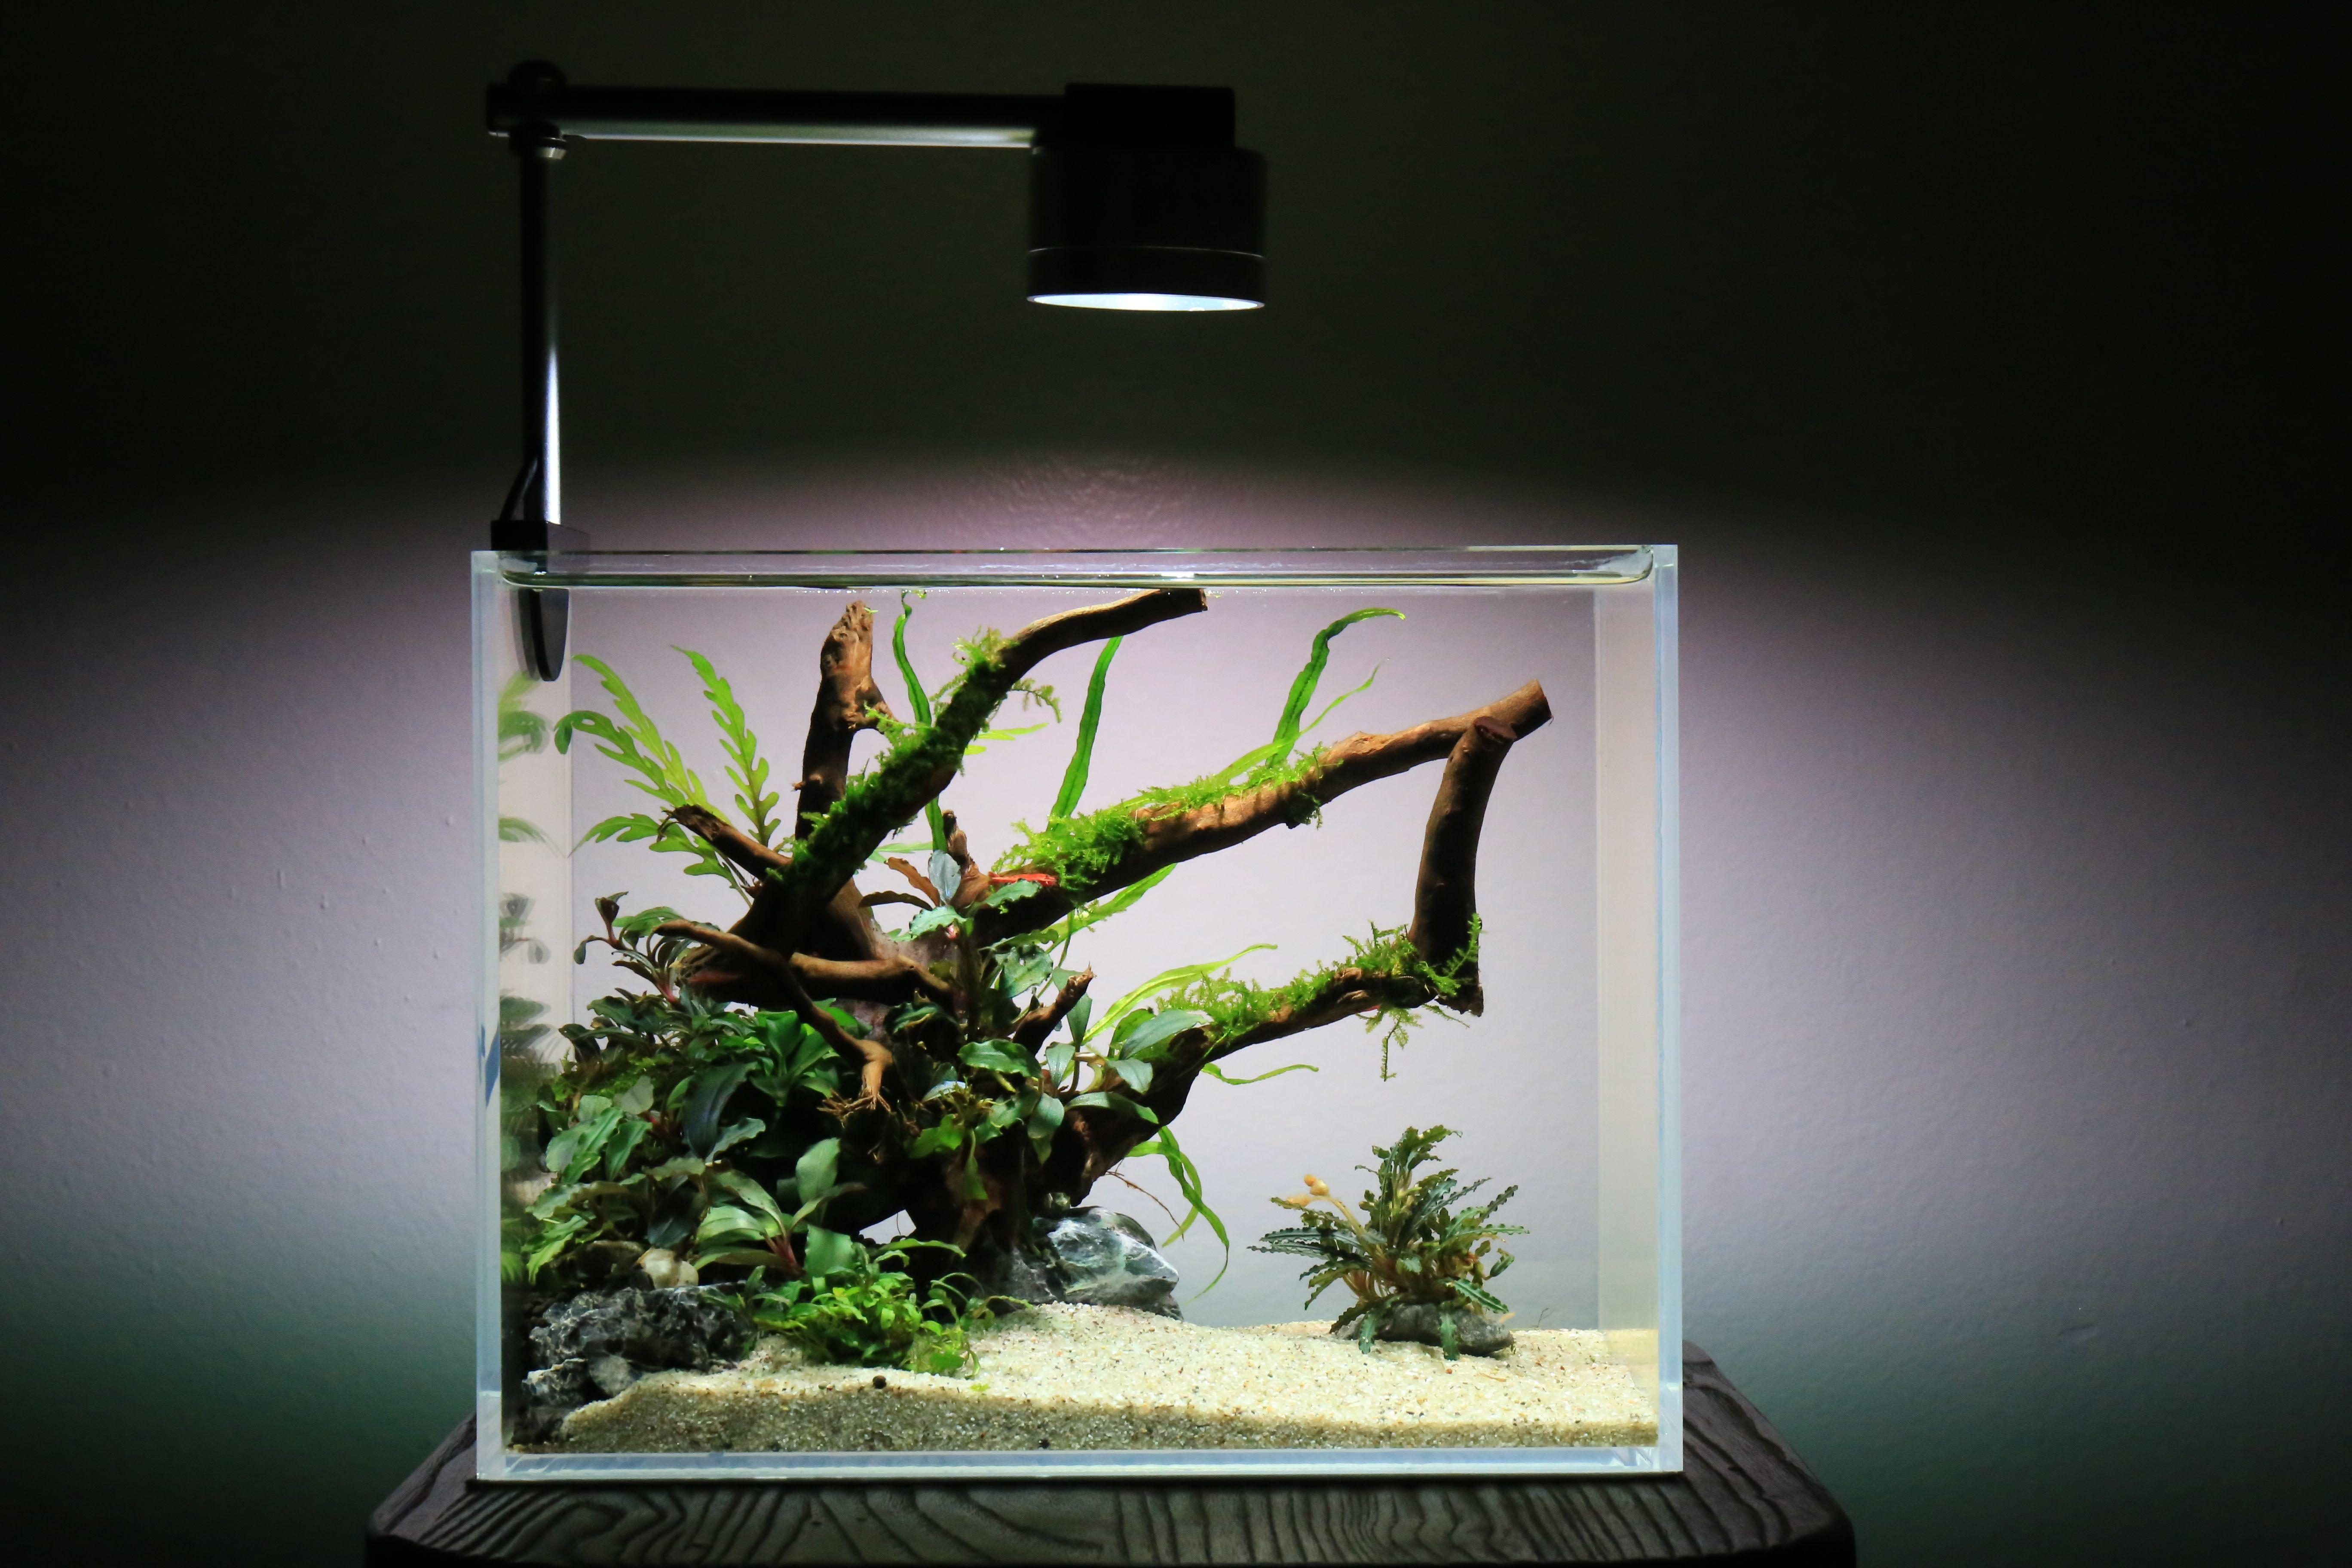 a66c36e2a70bdcbe8f2b84ae609b96ea Luxe De Aquarium Plastique Conception